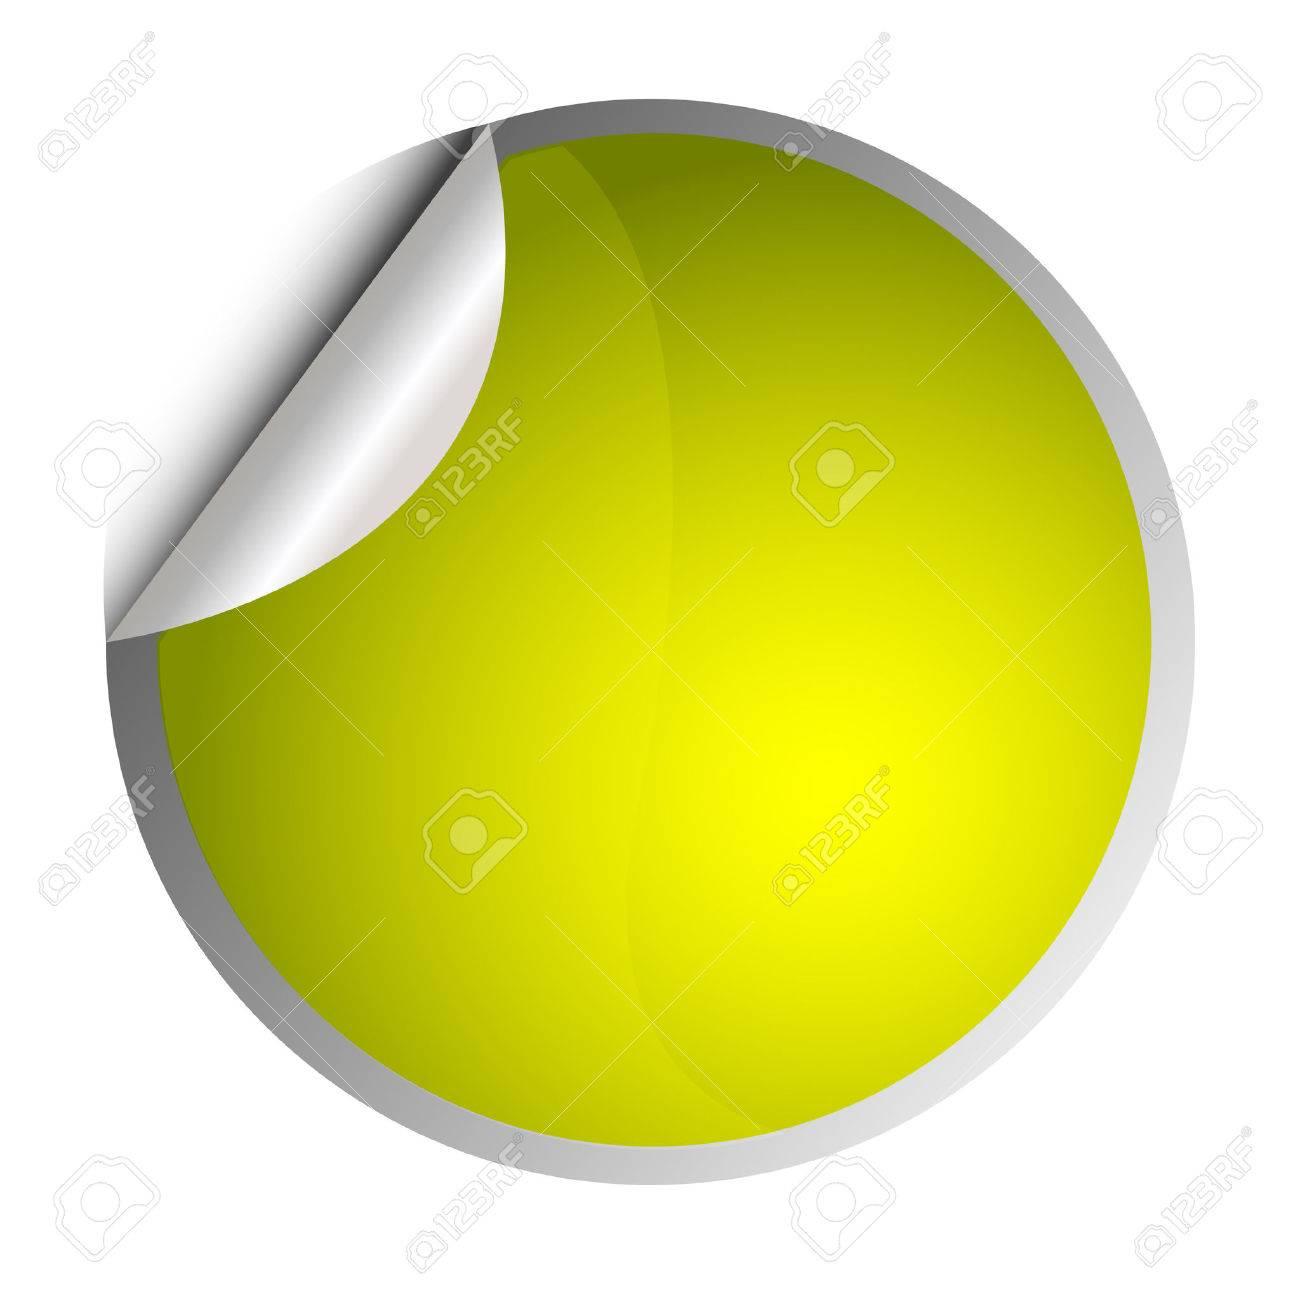 yellow sticker - postit Stock Vector - 8873053